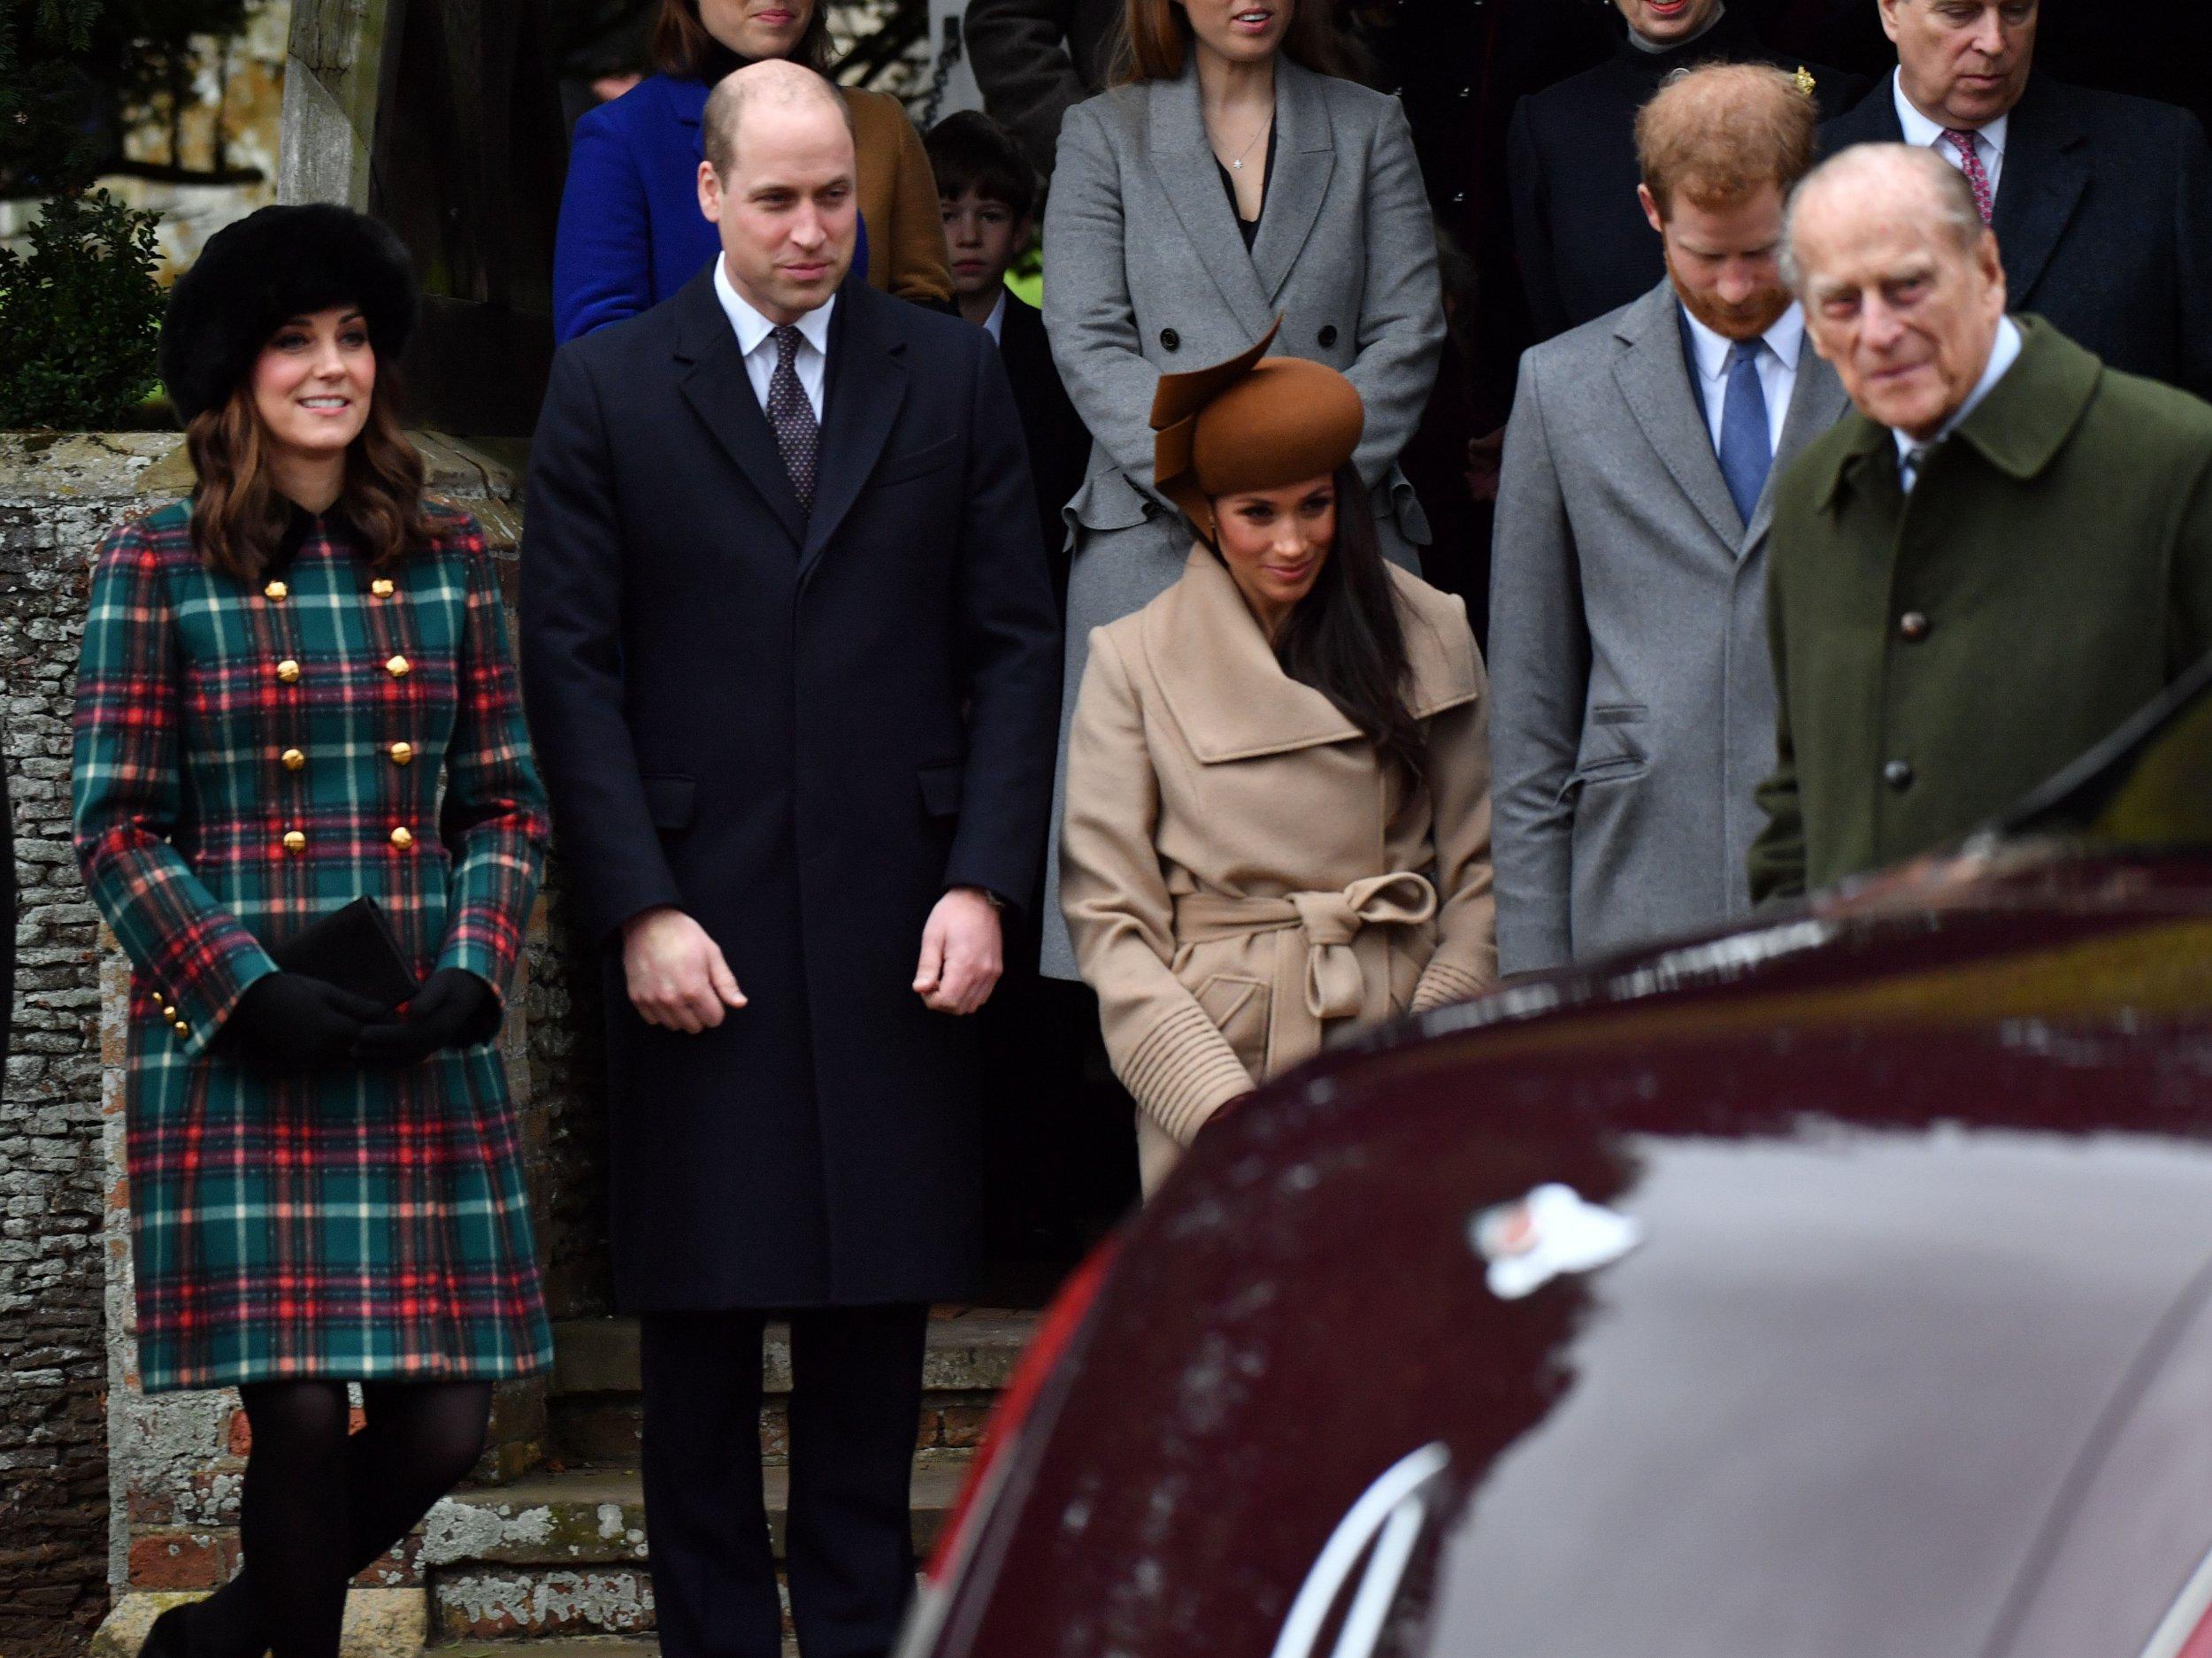 Mandatory Credit: Photo by Alan Davidson/REX/Shutterstock (9301549ad) Catherine Duchess of Cambridge, Prince William, Meghan Markle, Prince Harry Christmas Day church service, Sandringham, Norfolk, UK - 25 Dec 2017